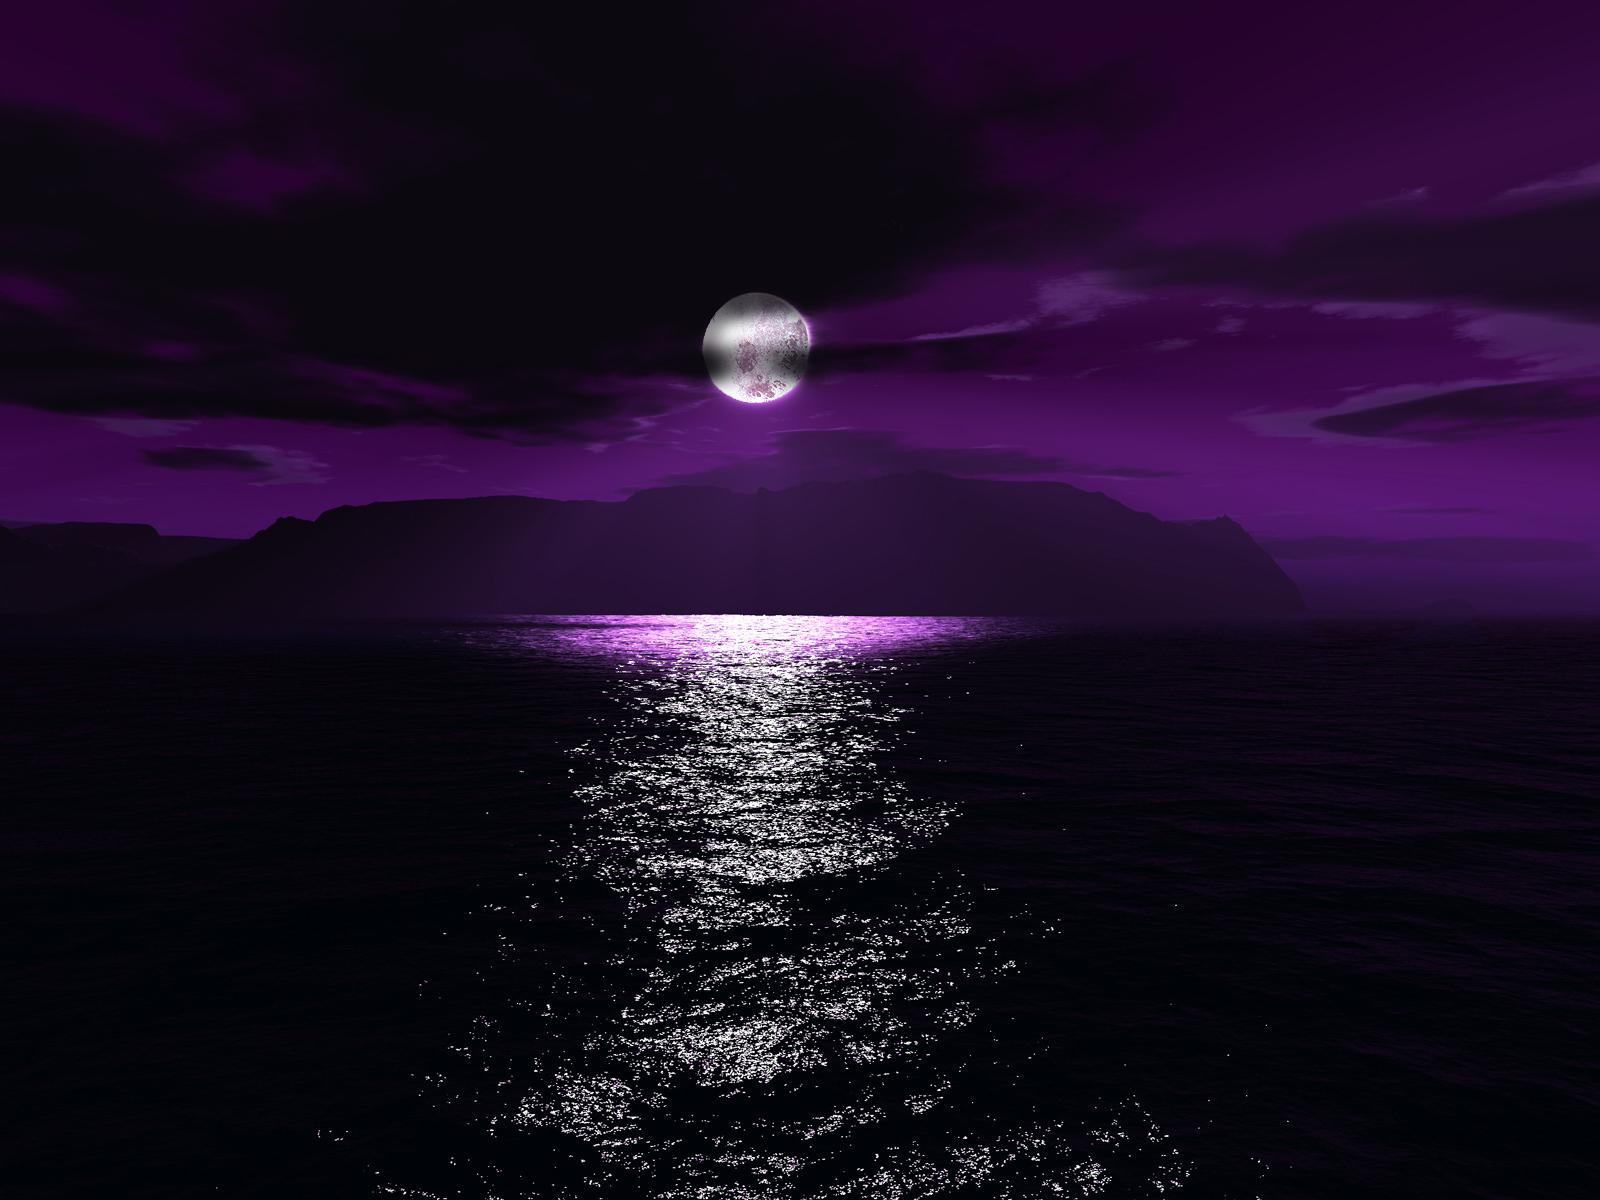 Hd purple space wallpaper wallpapersafari - Space moon wallpaper ...